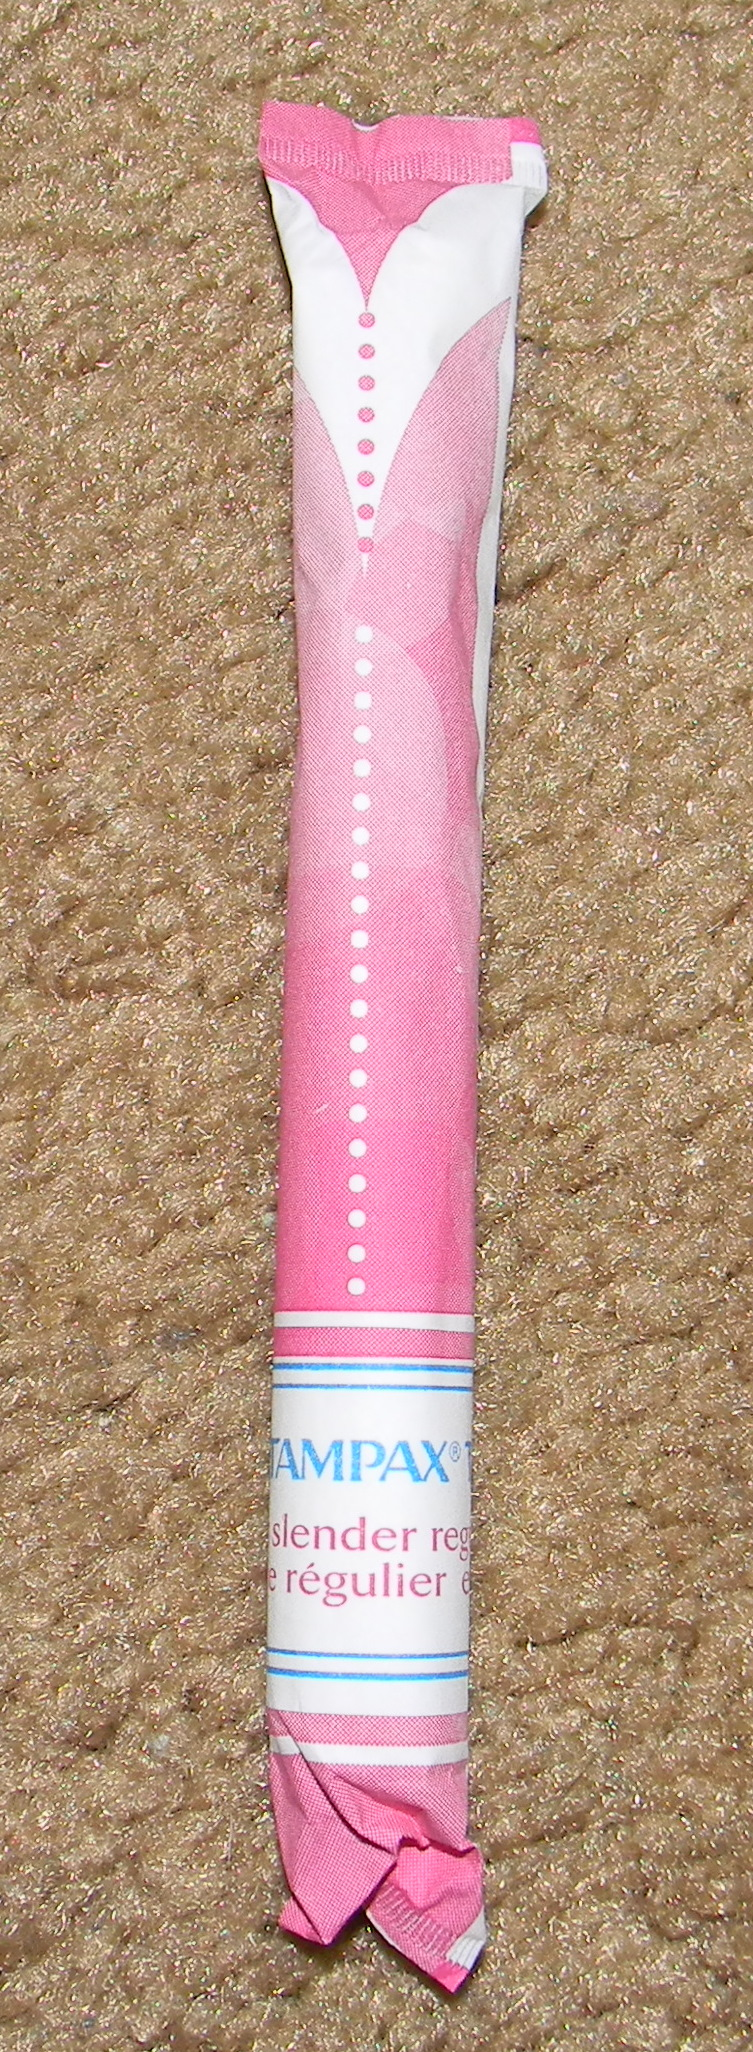 slender tampons for girls